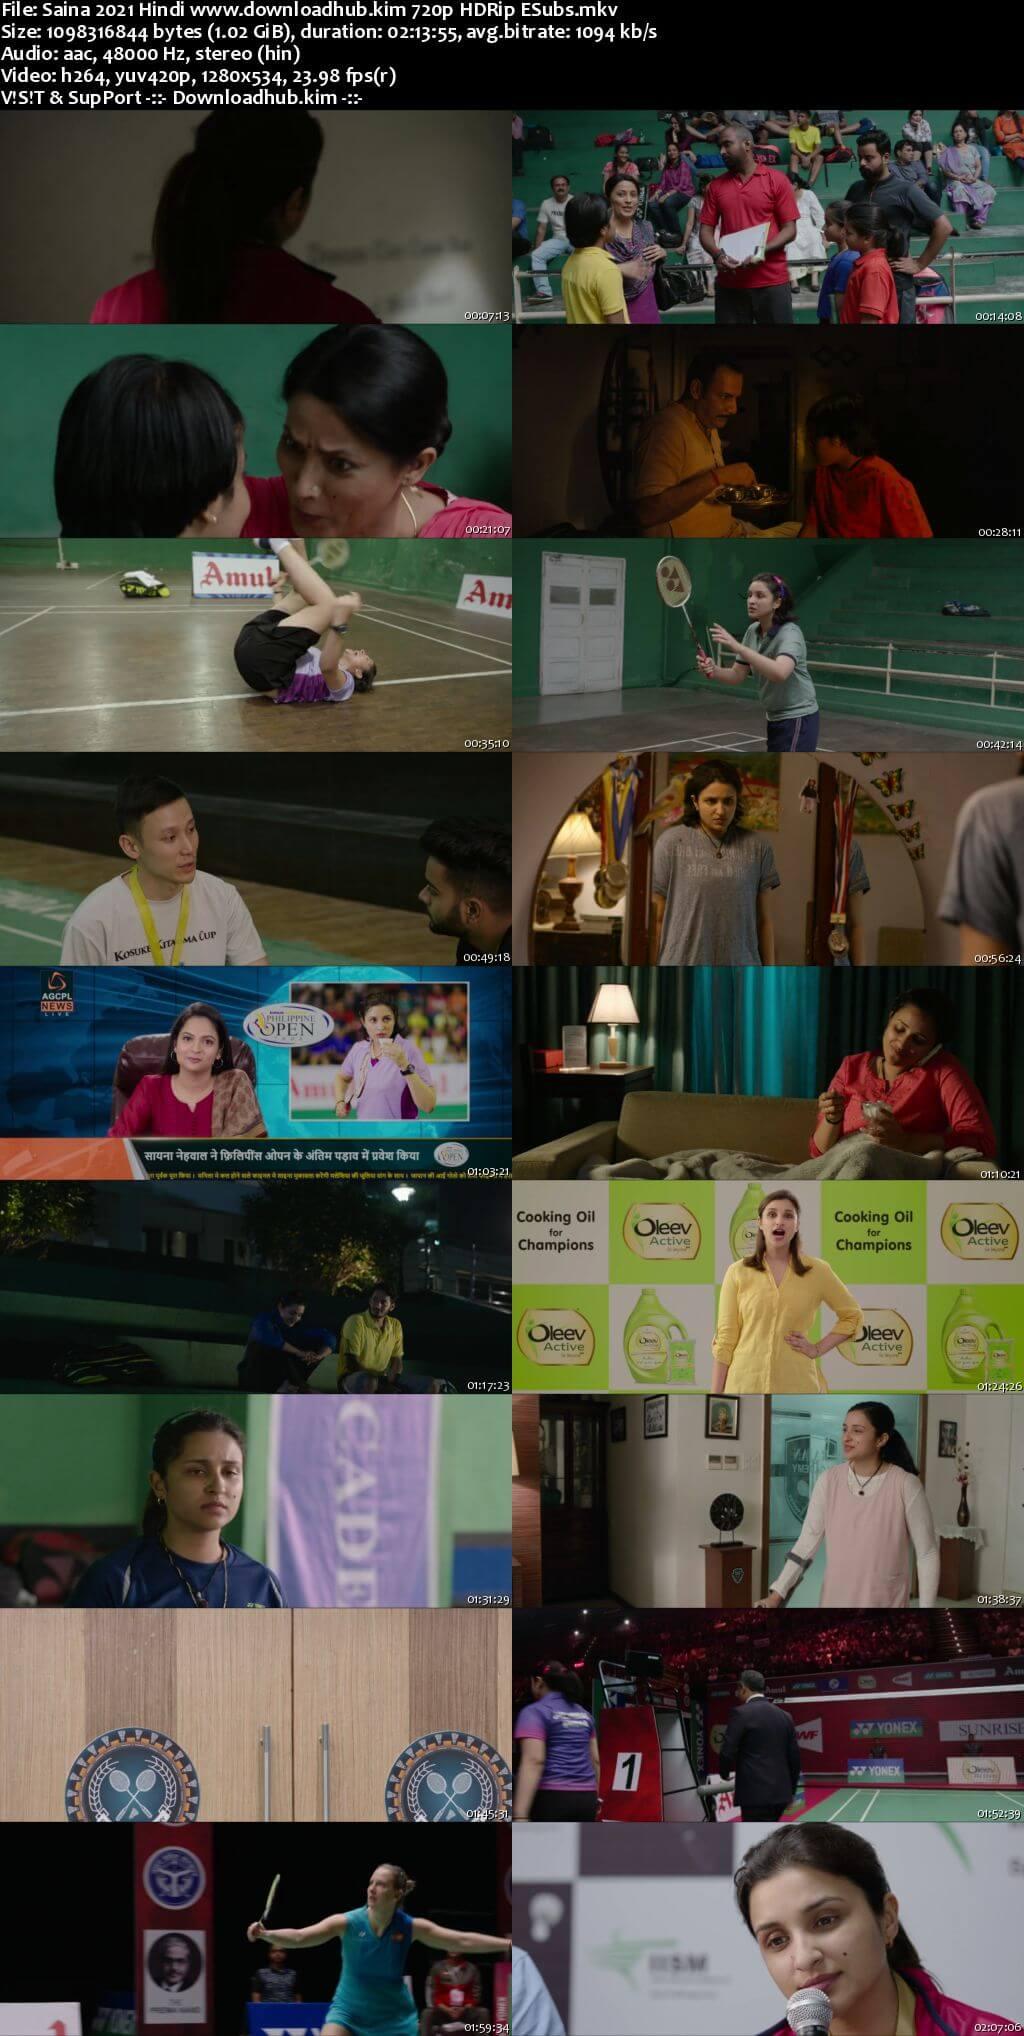 Saina 2021 Hindi 720p HDRip ESubs